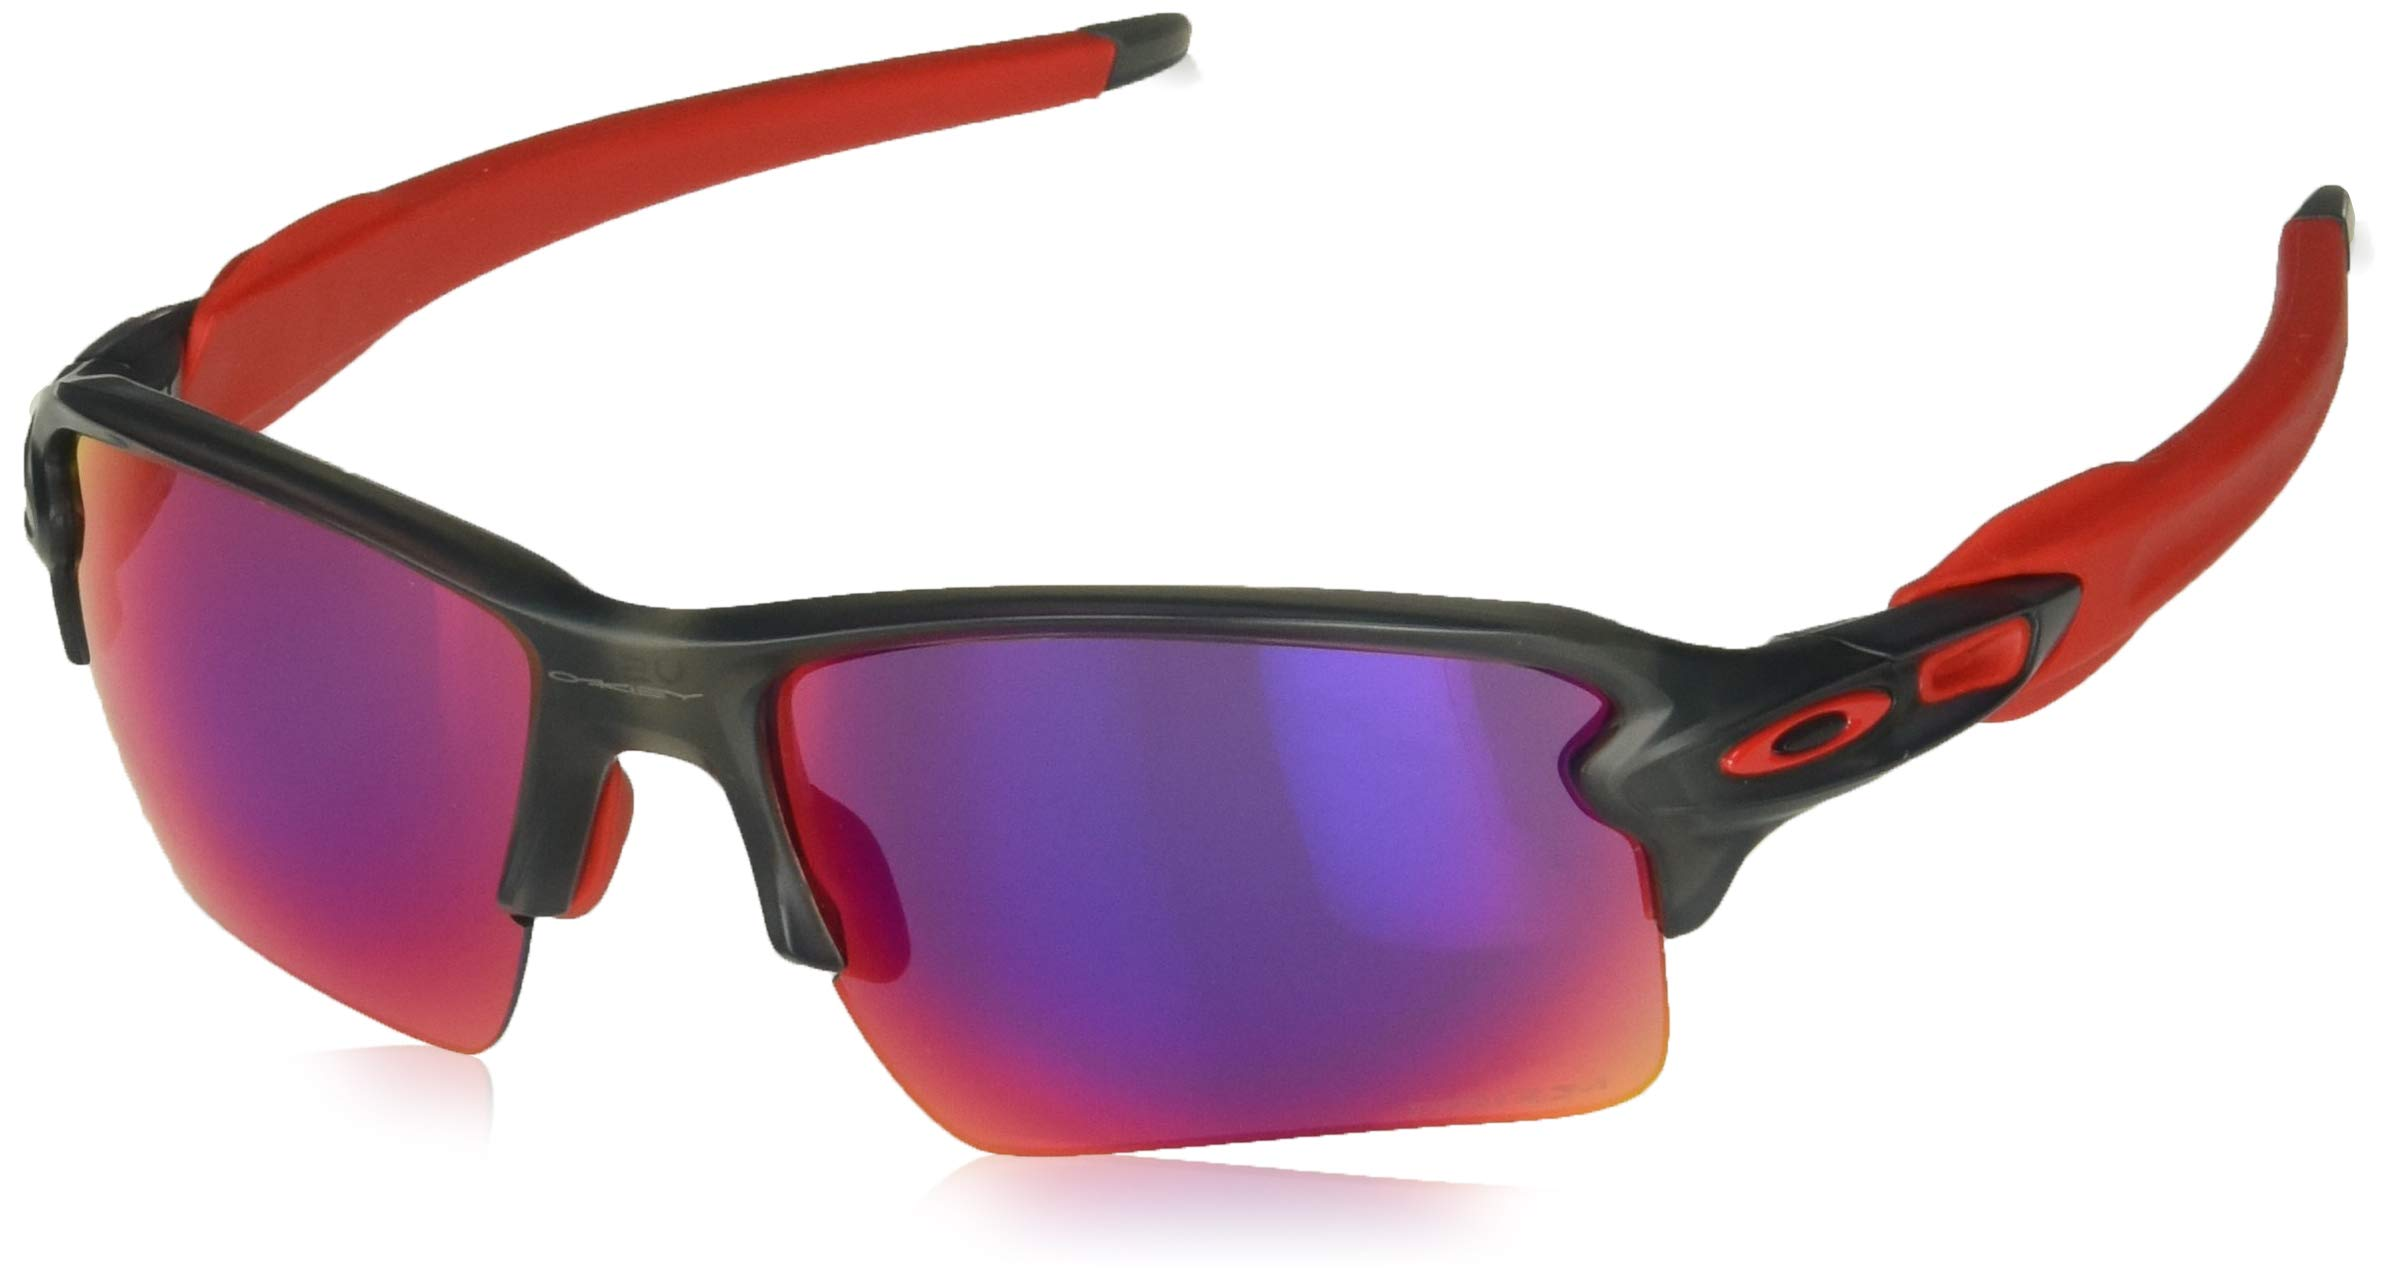 Oakley Men's Flak 2.0 XL OO9188-04 Rectangular Sunglasses, Matte Grey Smoke, 59 mm